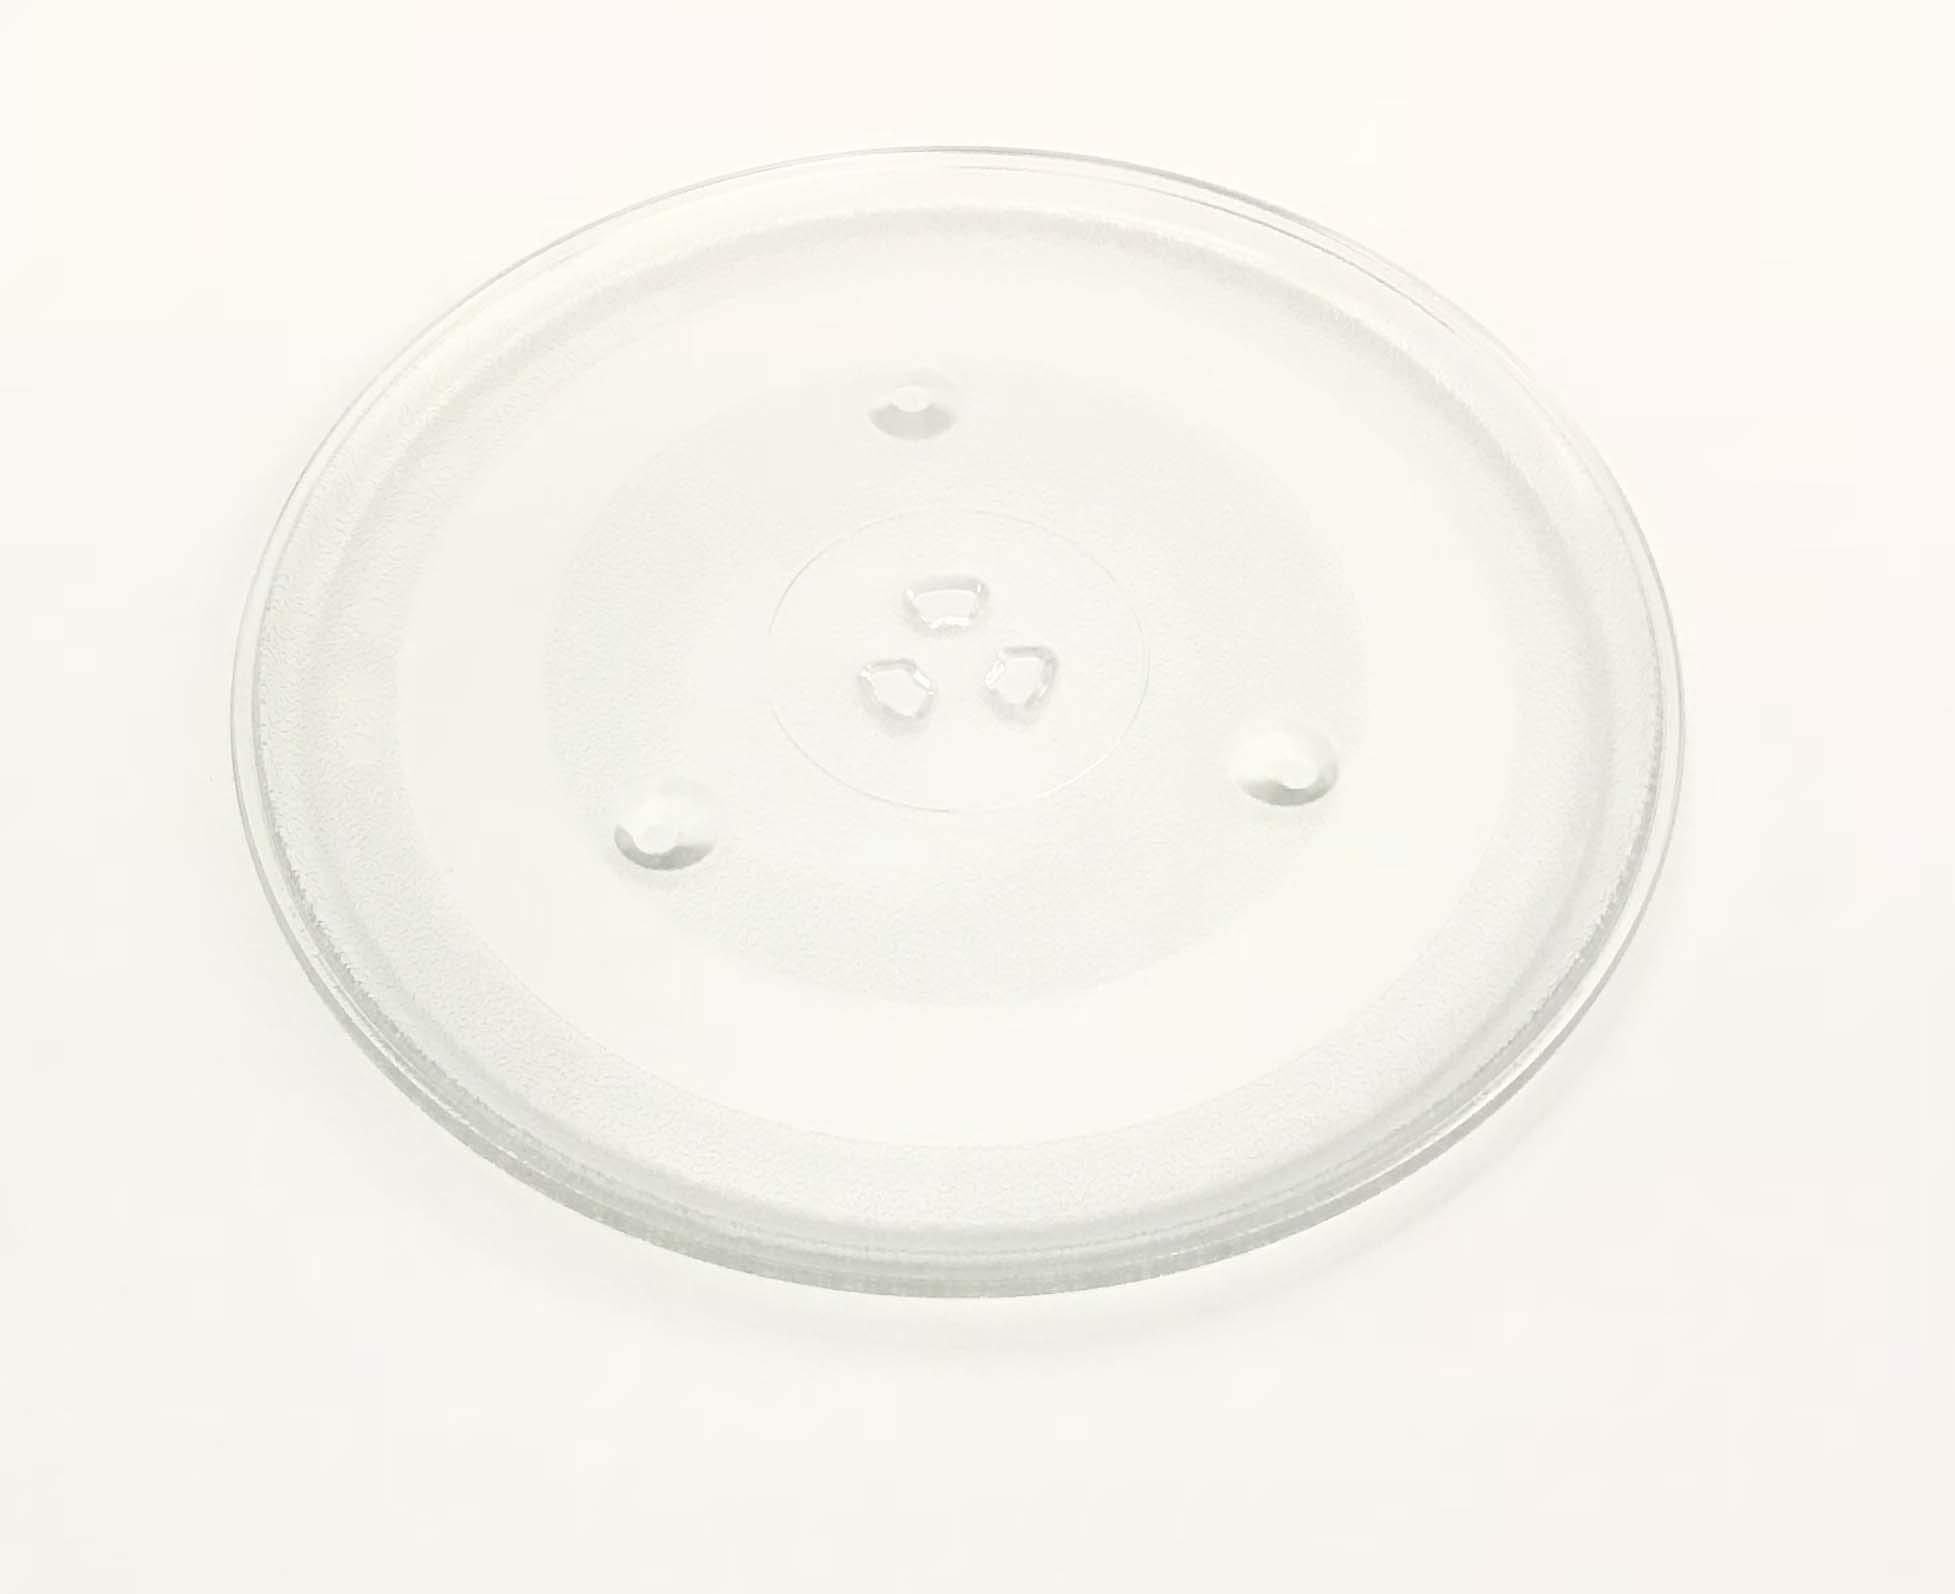 OEM Panasonic Microwave Glass Plate Turntable Specifically for NNSU656B, NN-SU656B, NNSU686S, NN-SU686S